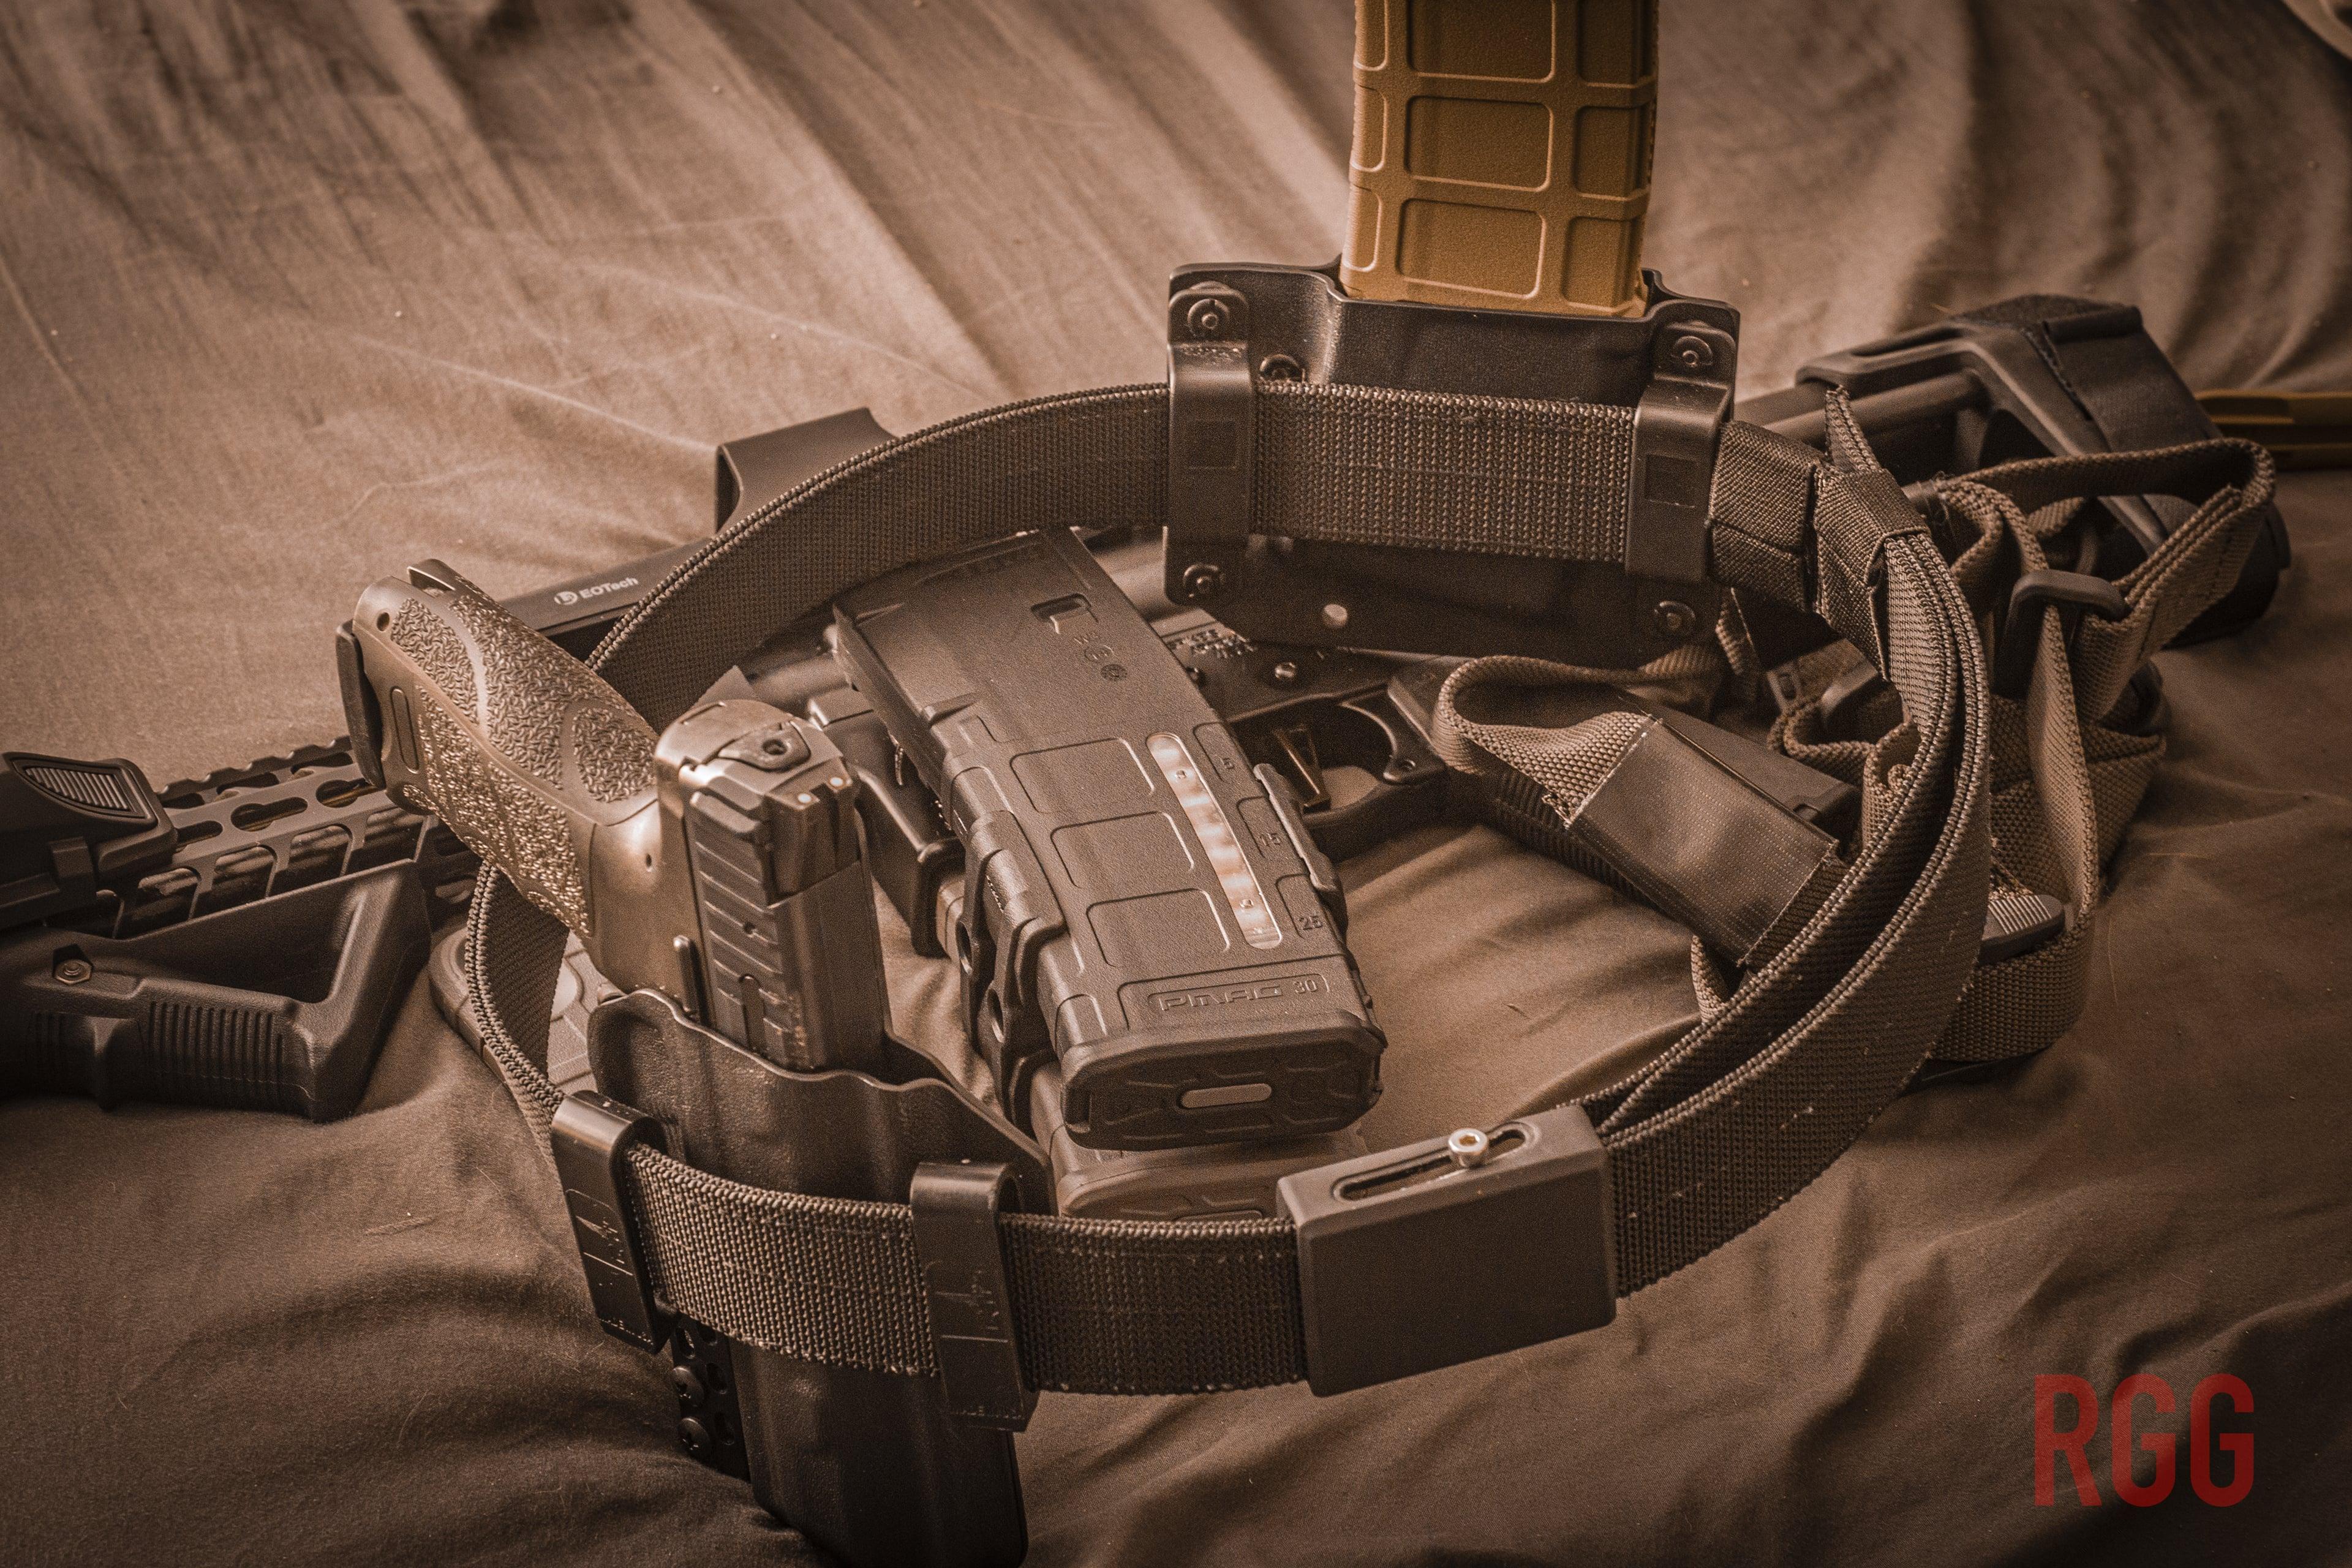 The Bravo Concealment Cinturon - A Great Gun Belt.